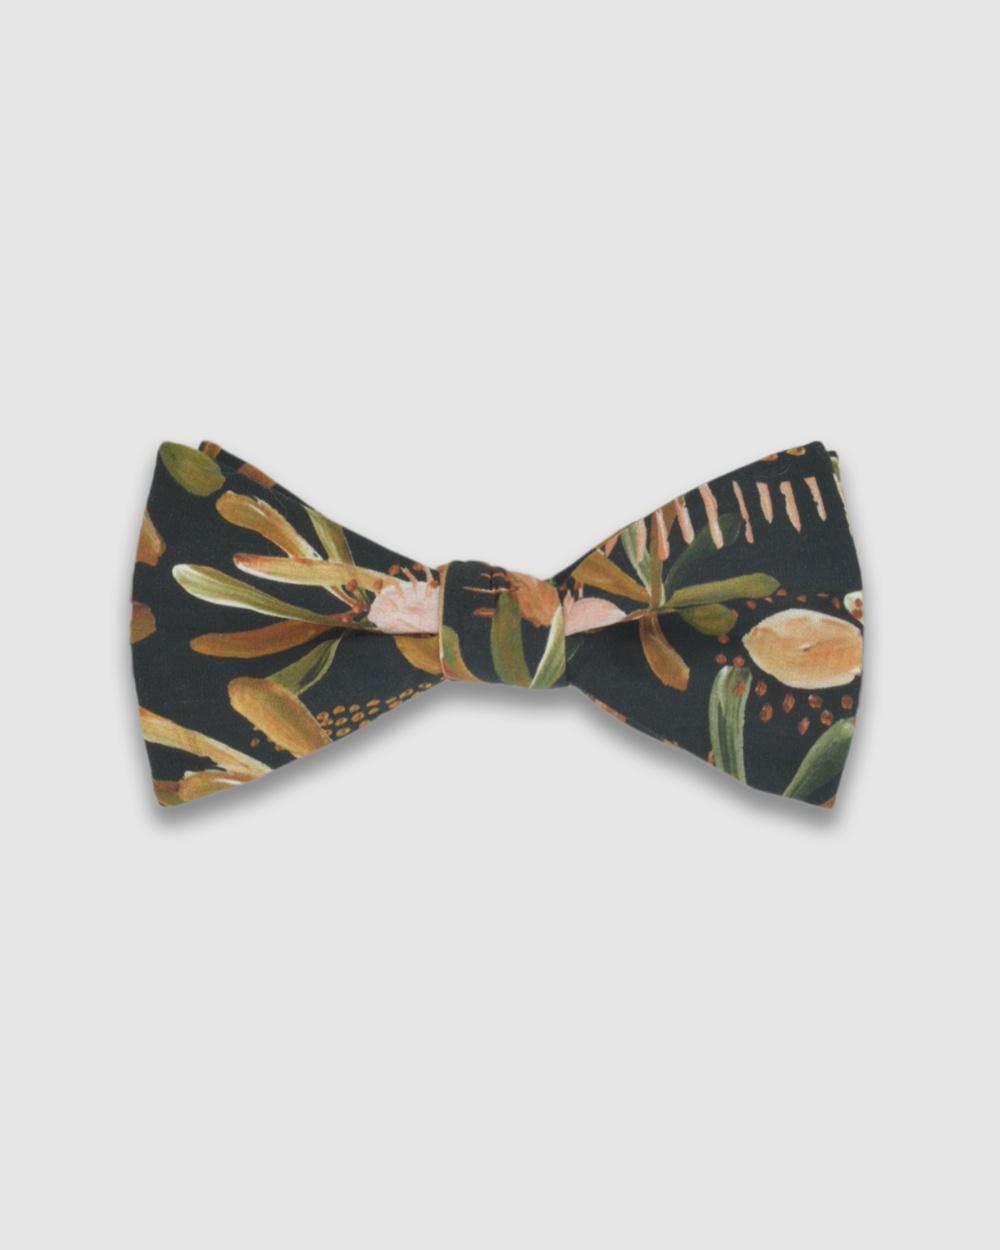 Peggy and Finn Grass Tree Bow Tie Ties & Cufflinks Black Bow Ties Australia